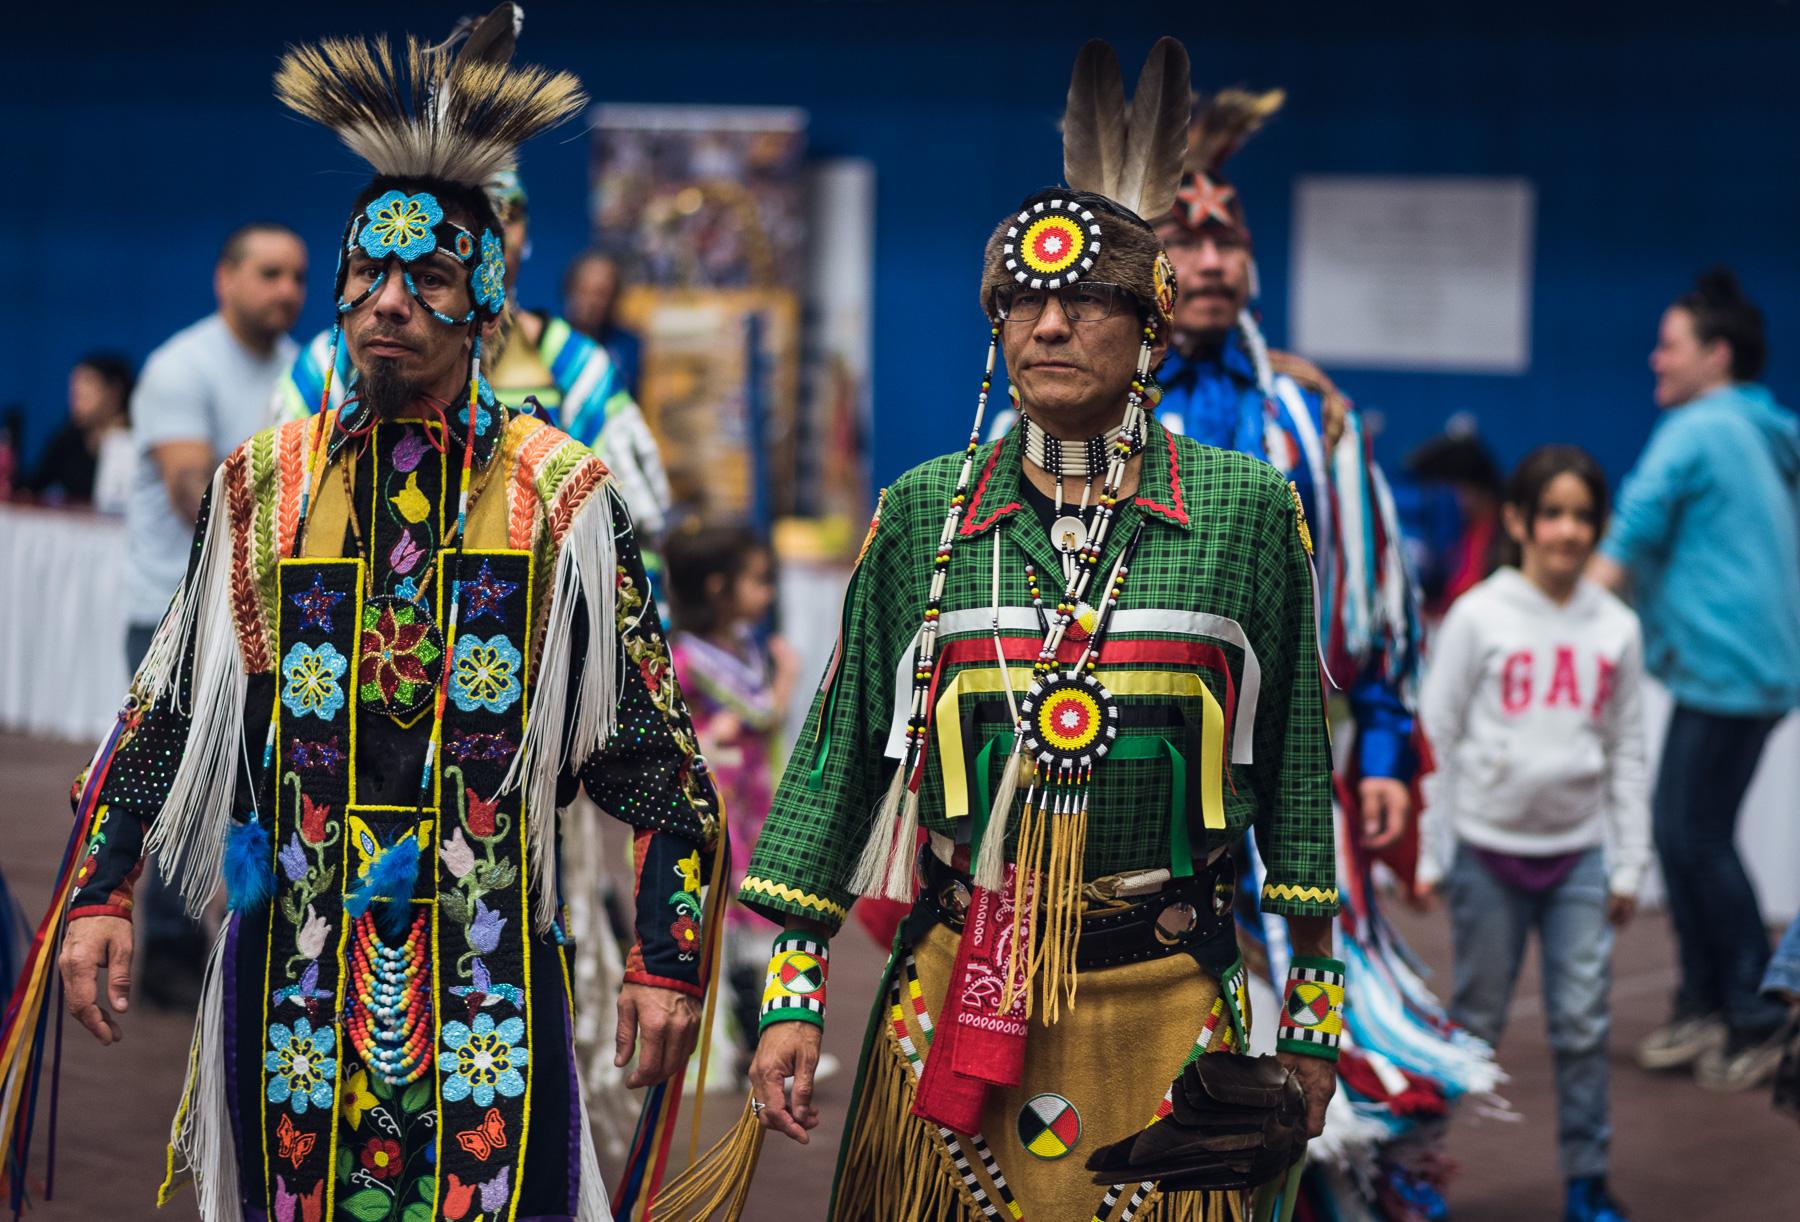 31st-Annual-LUNSA-Powwow-Blog-74.jpg